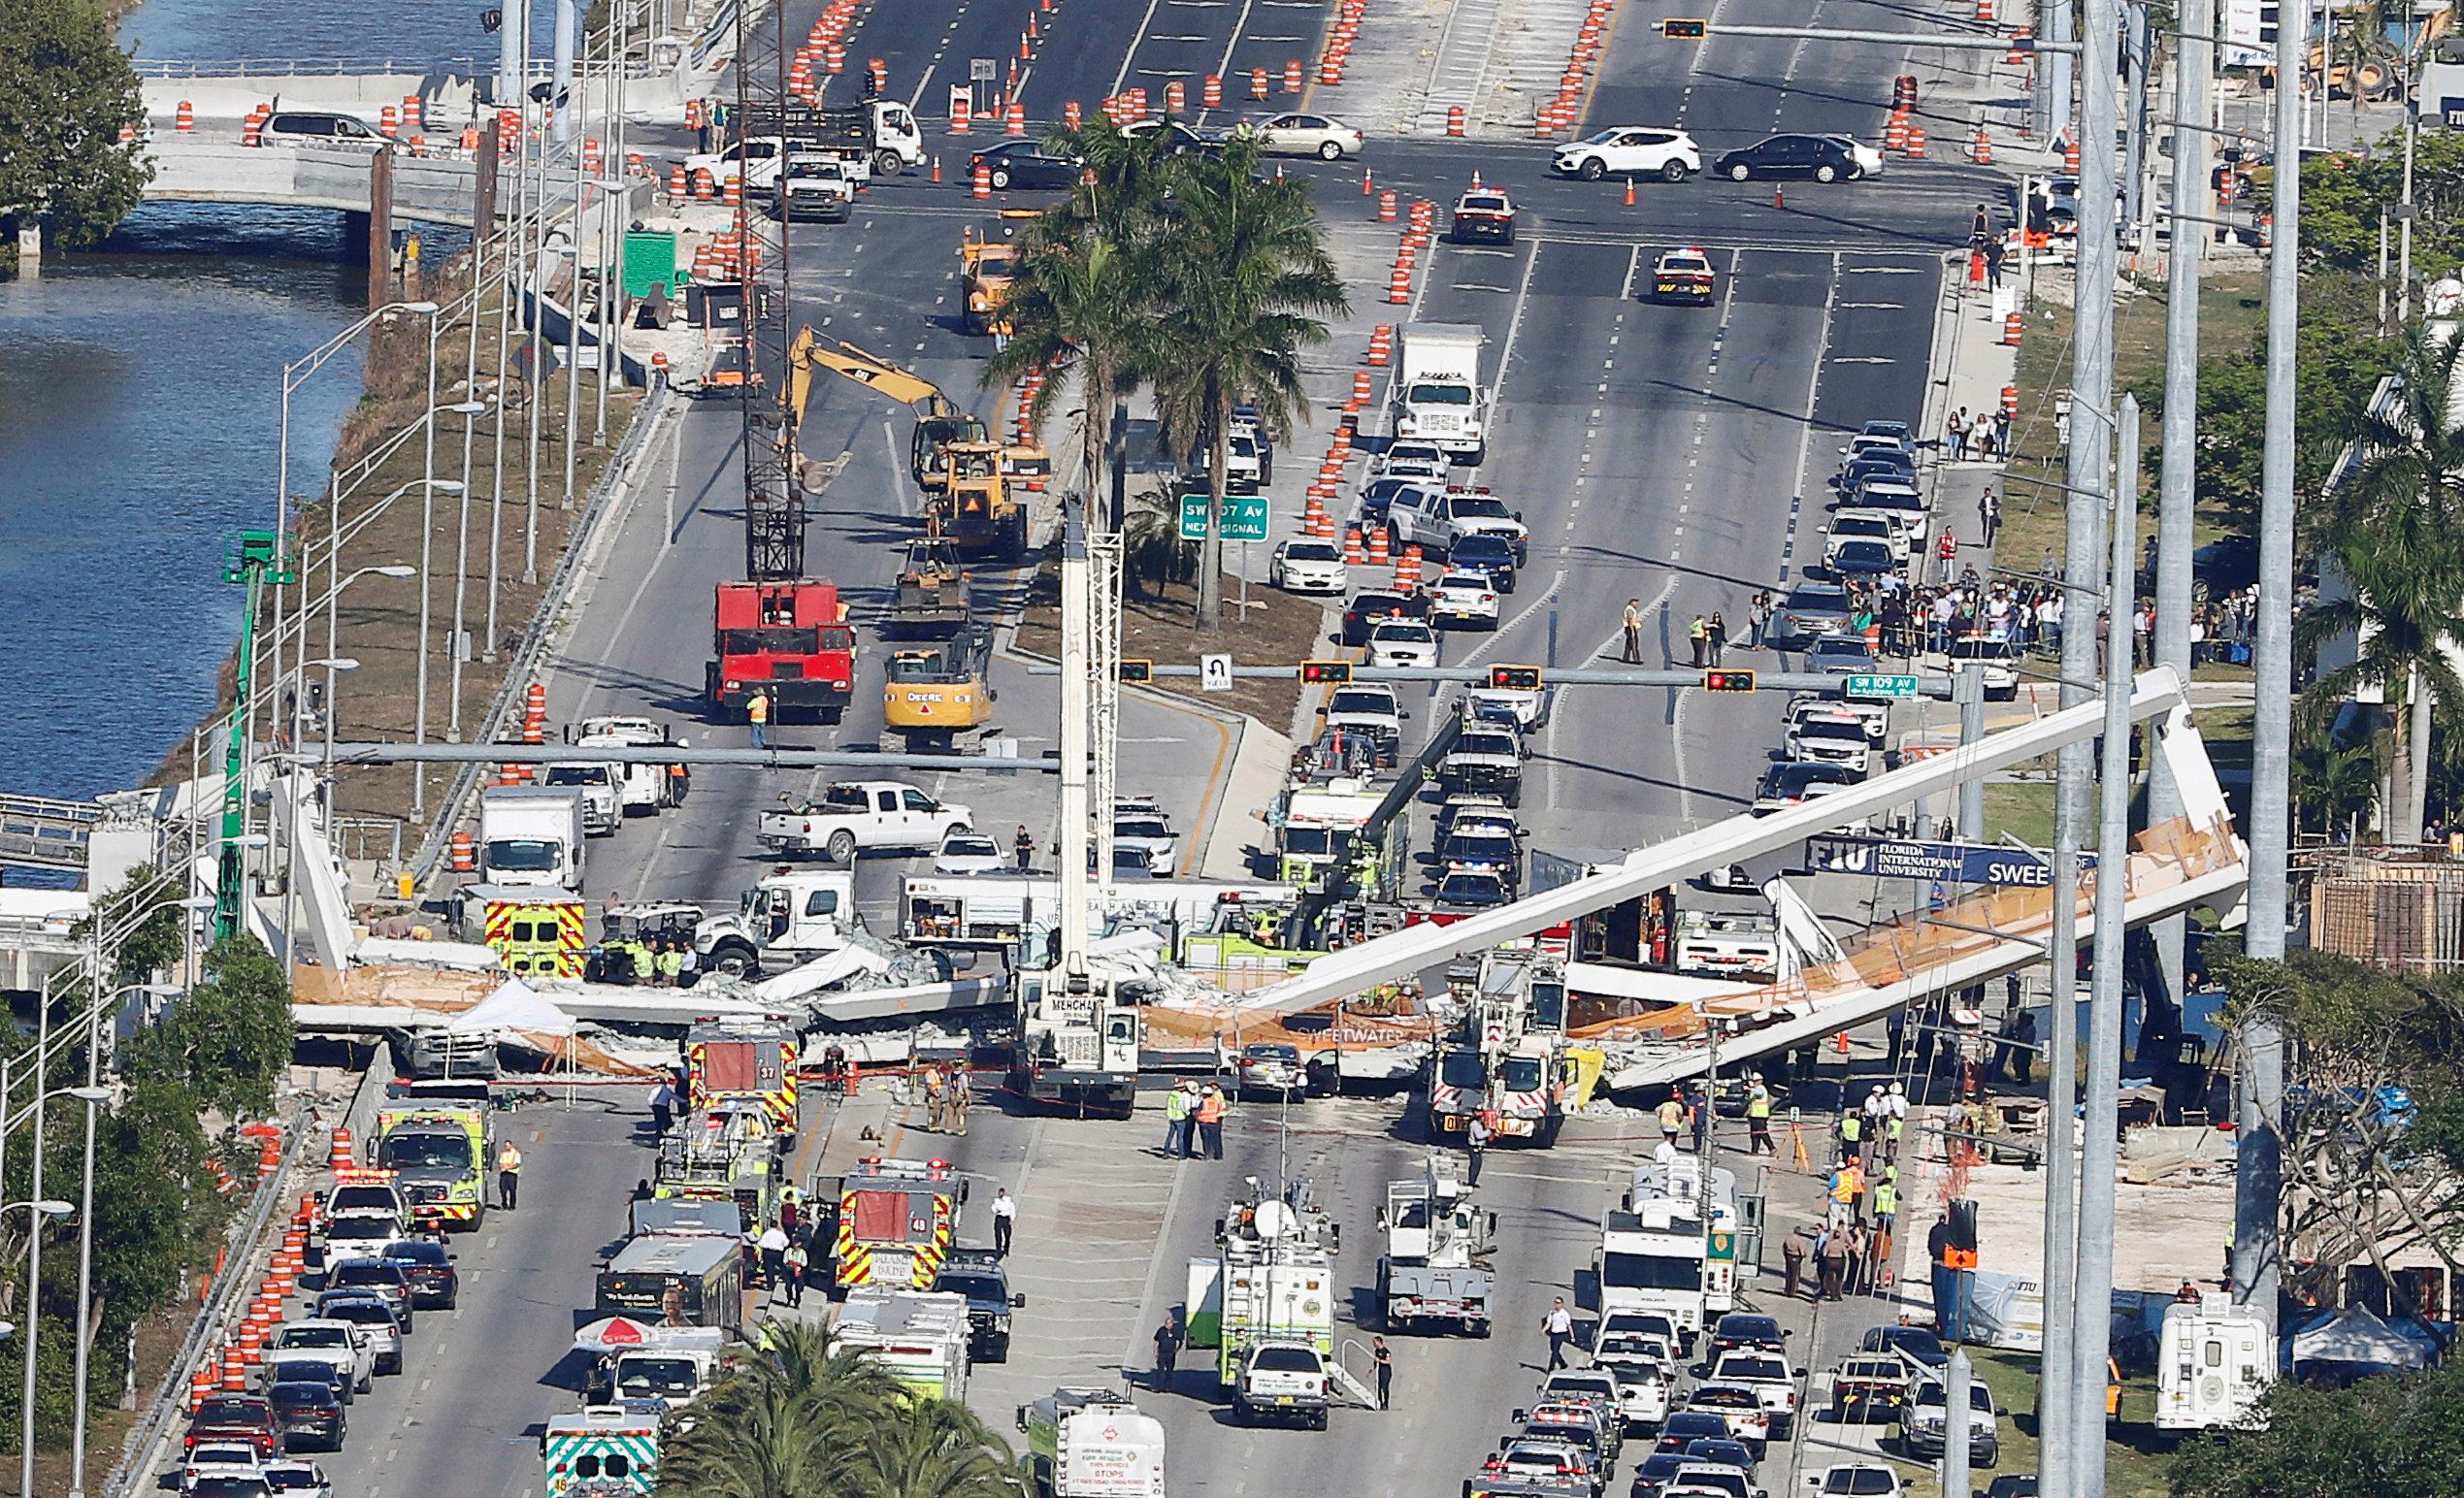 FILE PHOTO: Aerial view shows a pedestrian bridge collapsed at Florida International University in Miami, Florida, U.S., March 15, 2018. REUTERS/Joe Skipper/File Photo